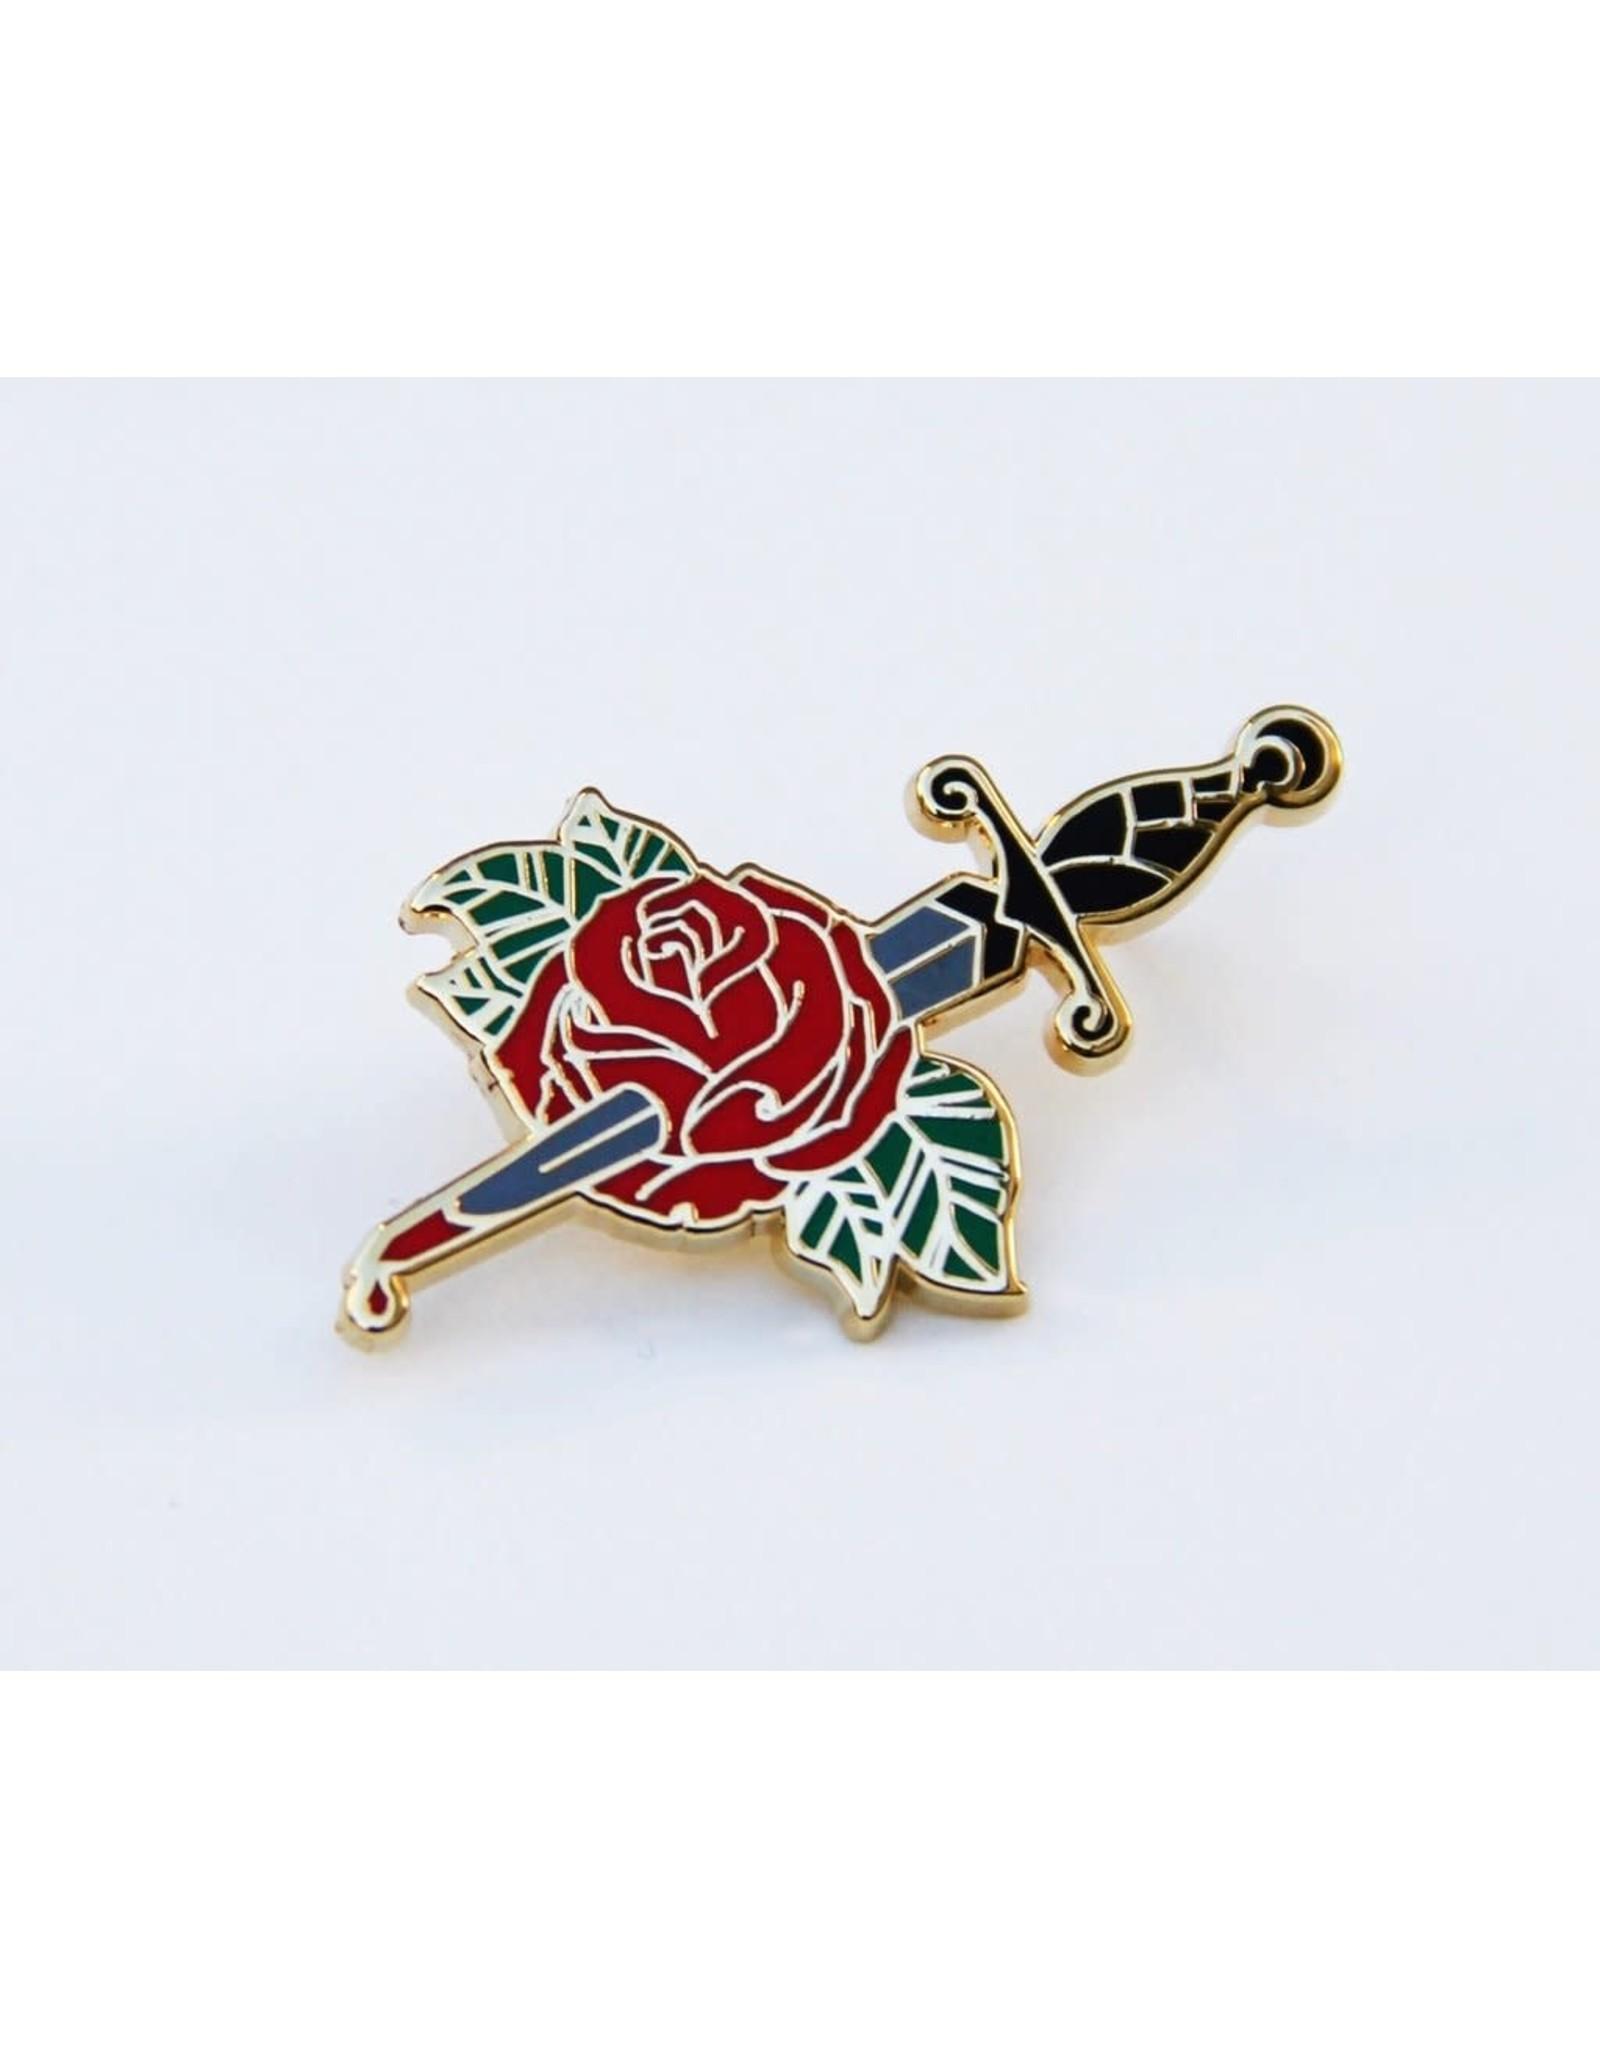 Enamel Pin Rose Bleeding Dagger Enamel Pin